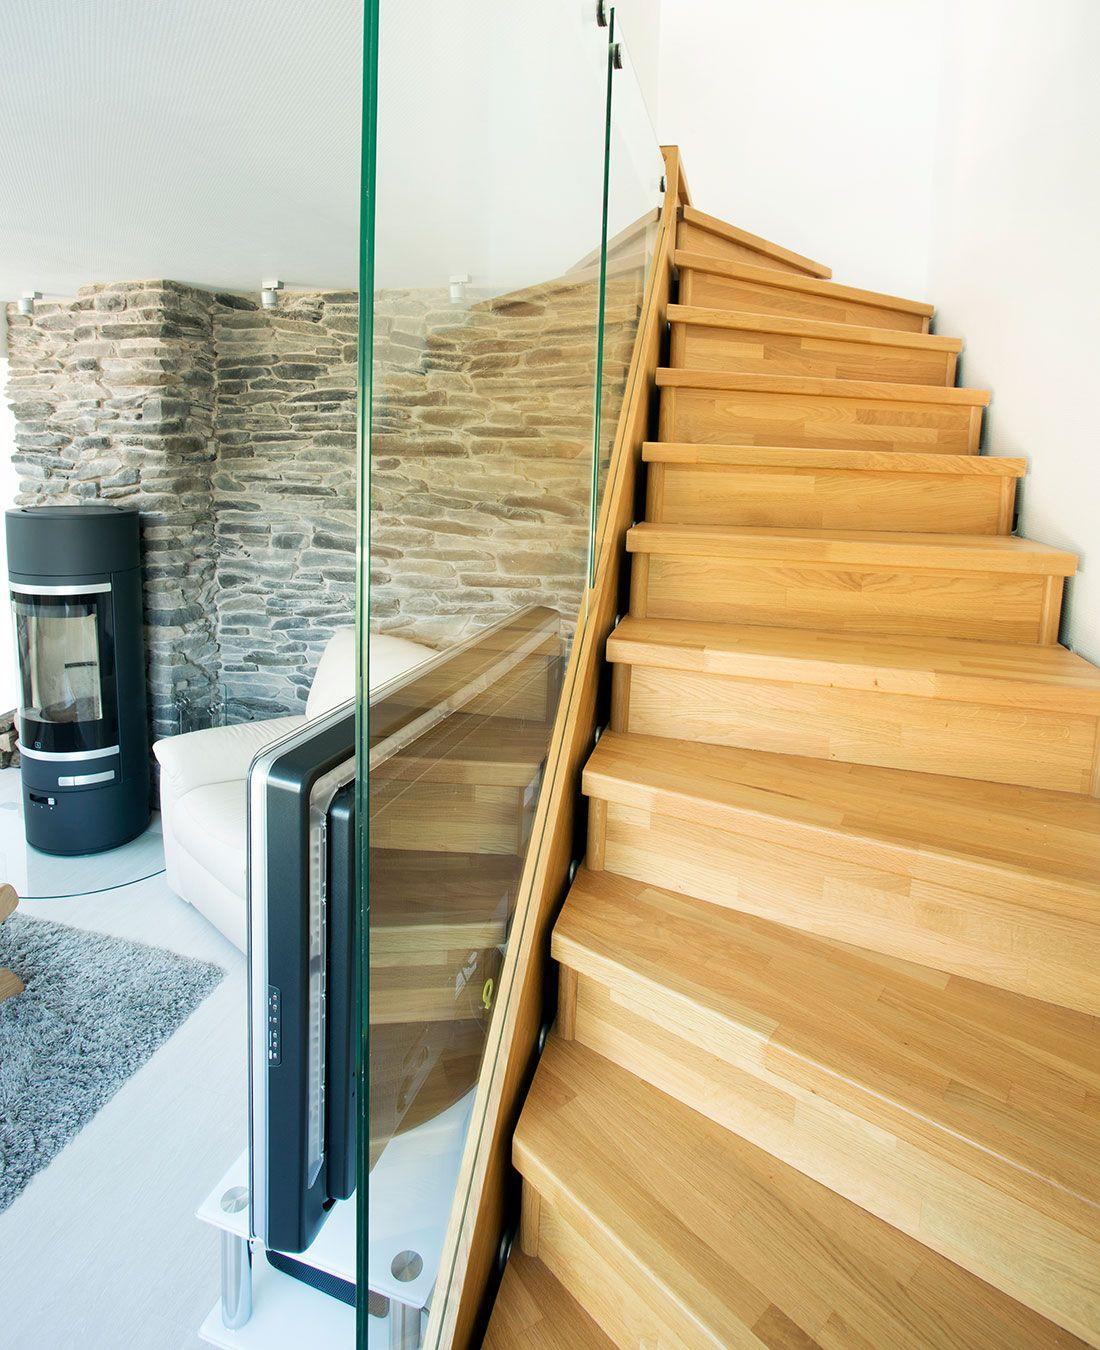 Best Design Treppe Holz Lebendig Aussieht Photos - Design & Ideas ...